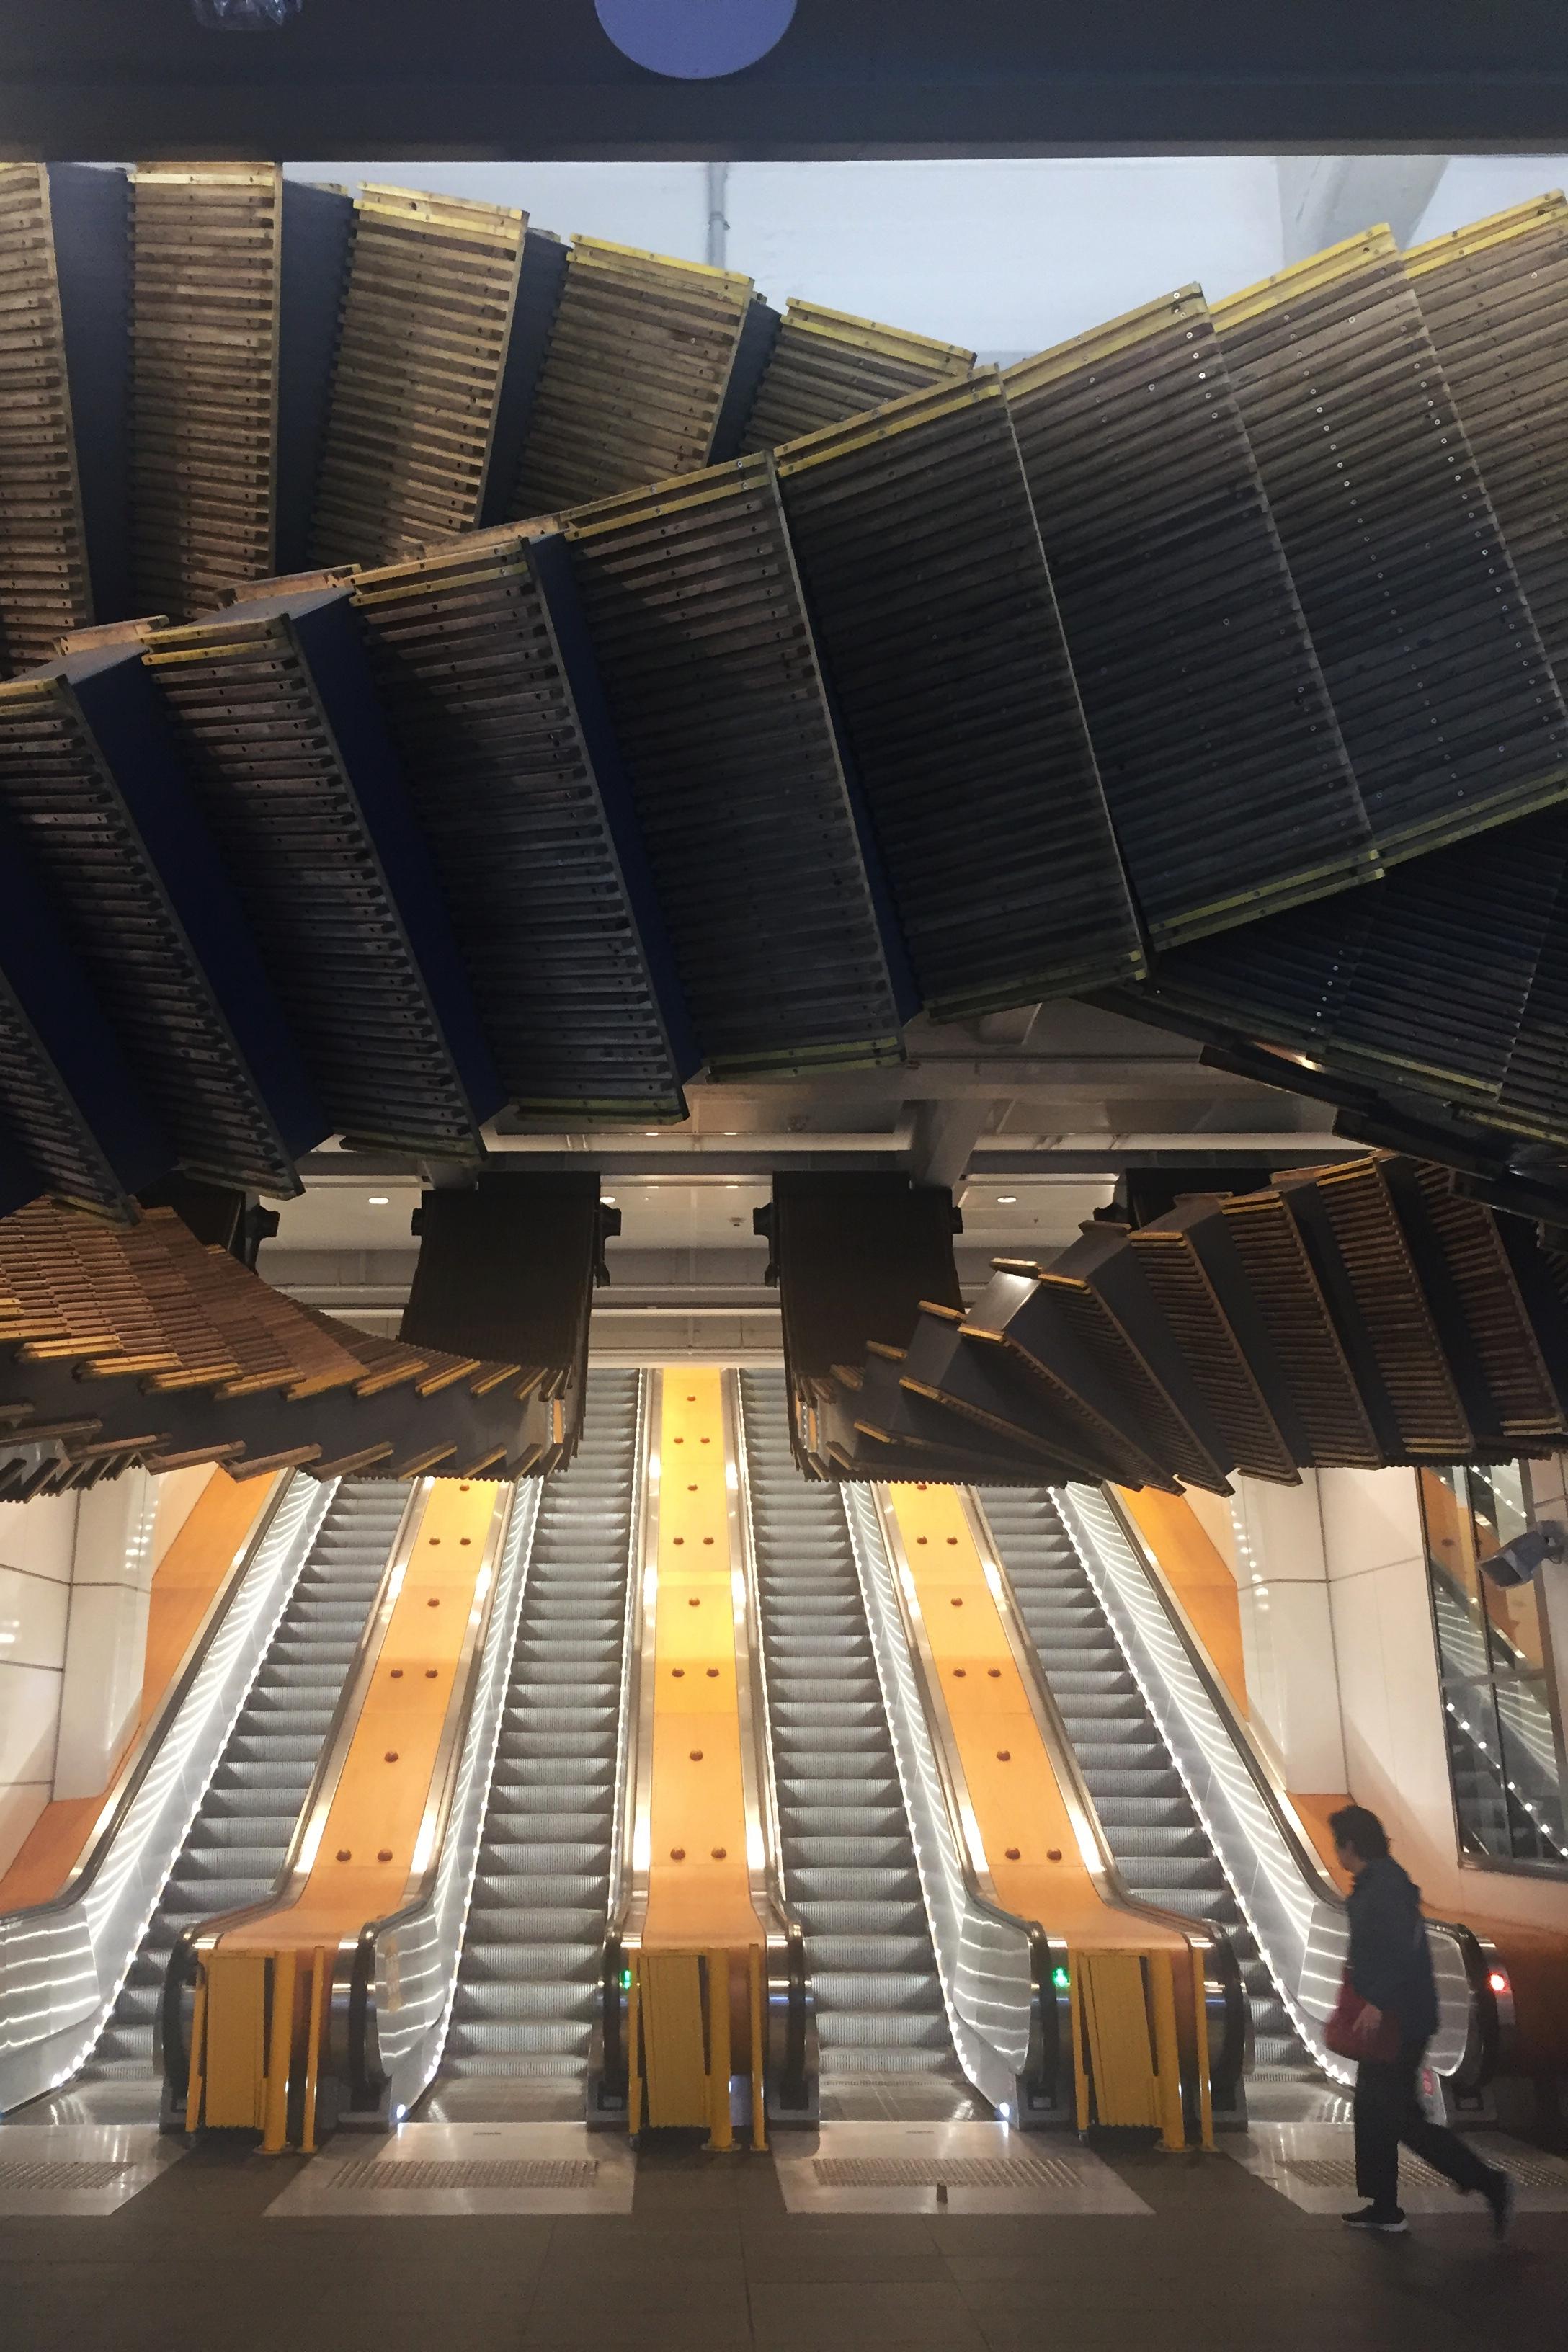 Wynyard Station's escalator banks